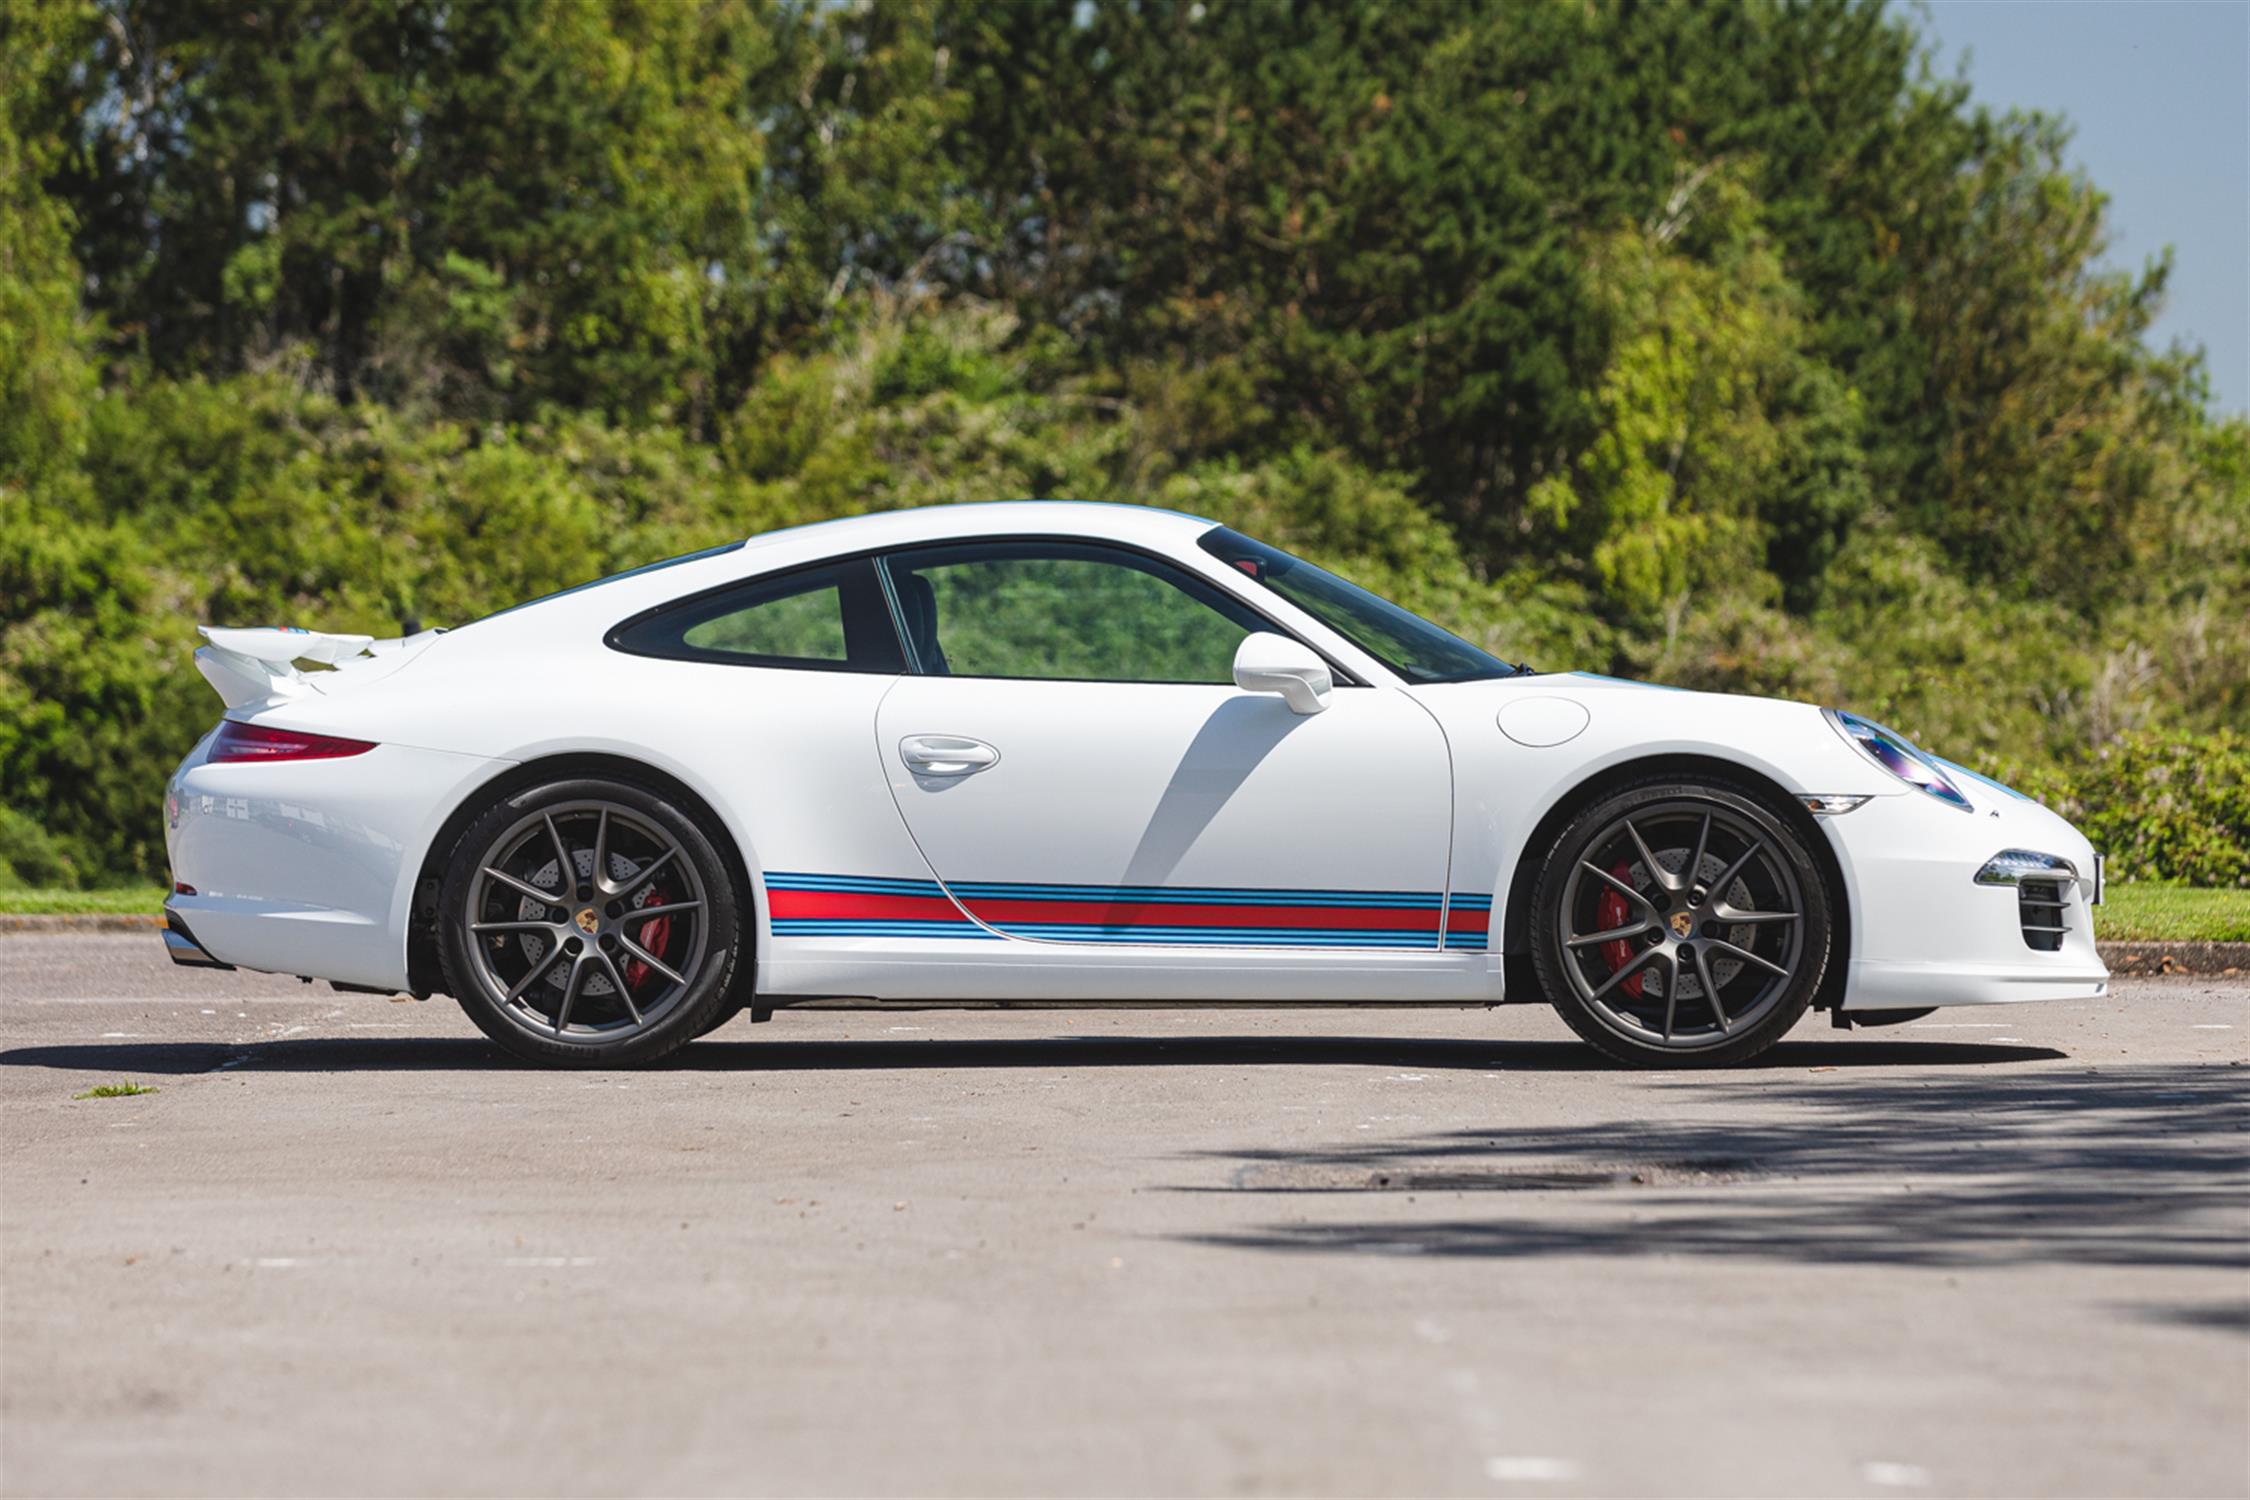 2014 Porsche 911 (991) 3.8 Martini Racing Edition (RHD) - Image 5 of 10